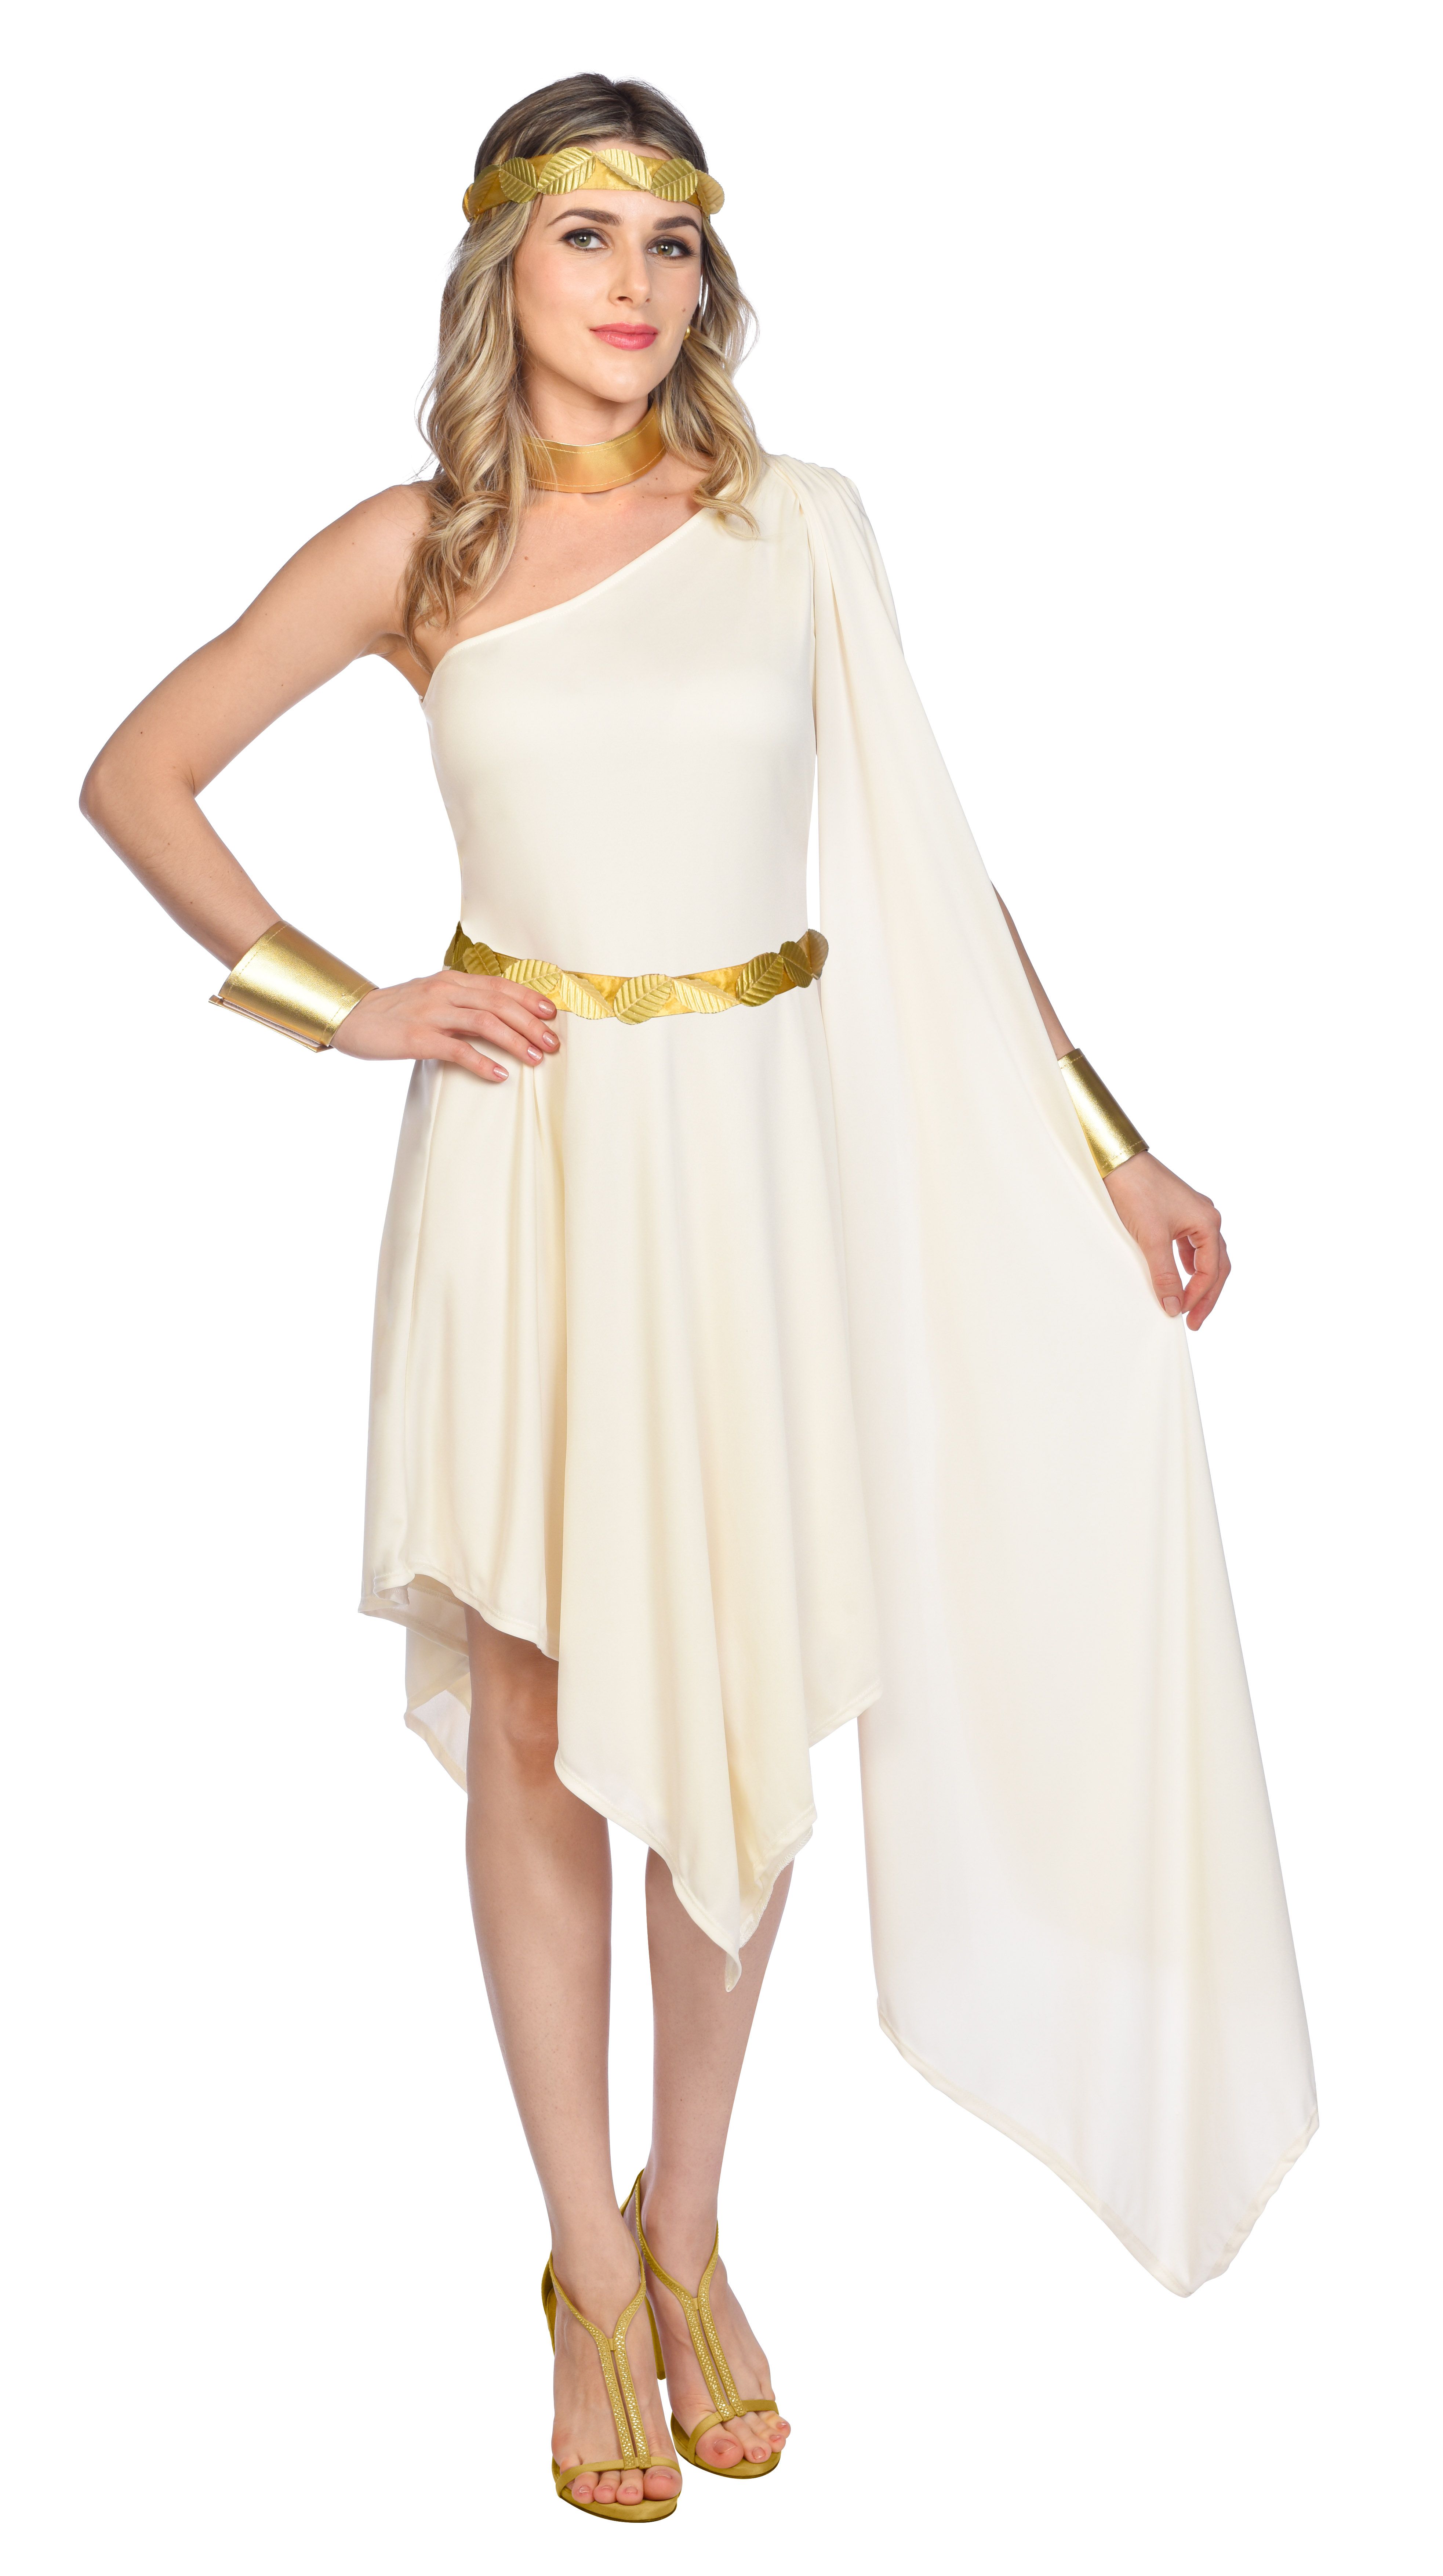 Indexbild 17 - Adult Ladies Golden Goddess Gladiator Greek Roman Toga Fancy Dress Costume New